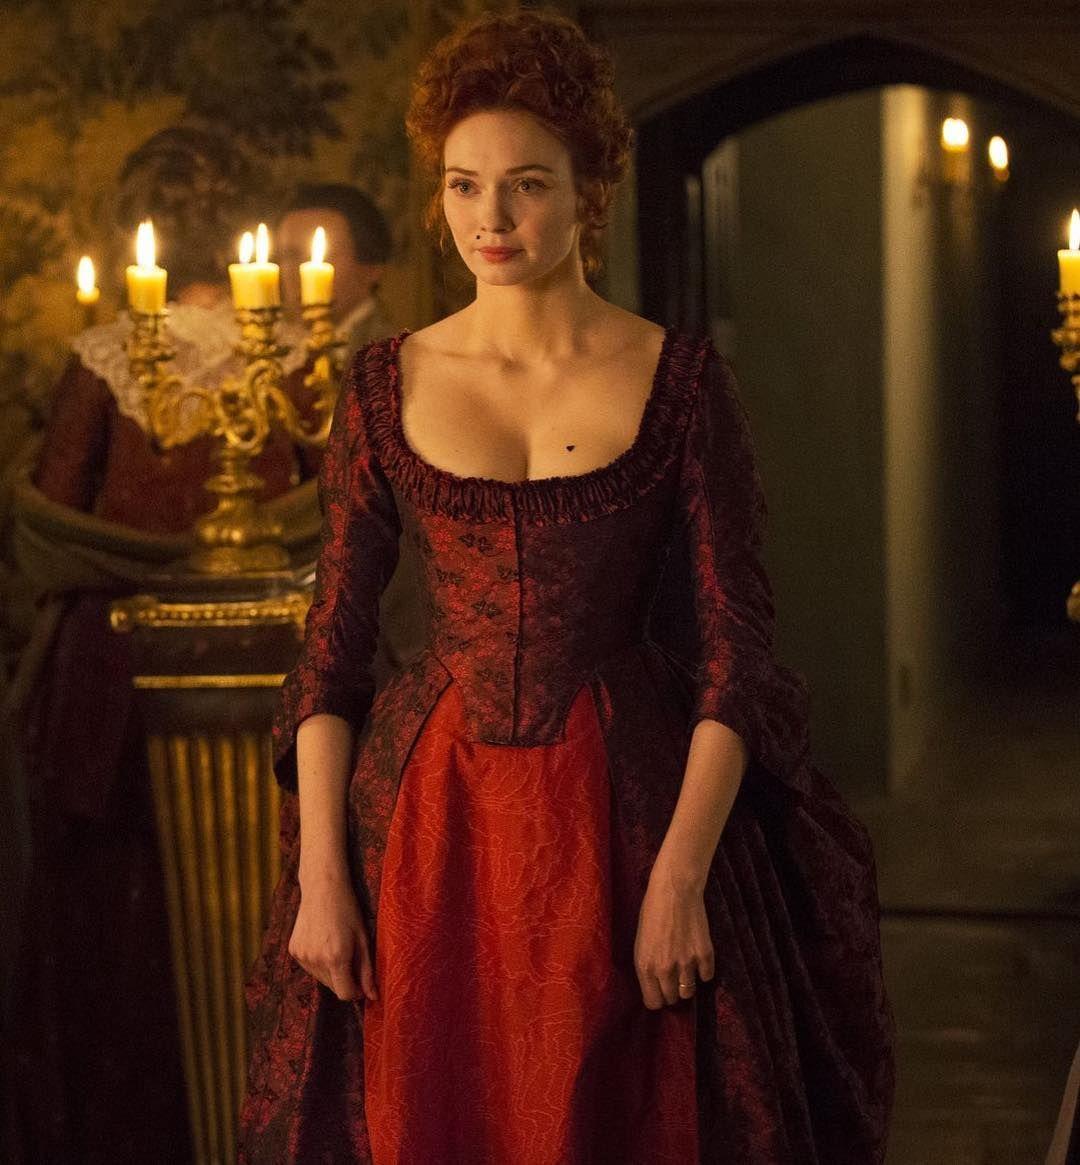 Kitty On Instagram Poldark Demelza Always Looks Good In A Red Dress Dresses Poldark 18th Century Fashion